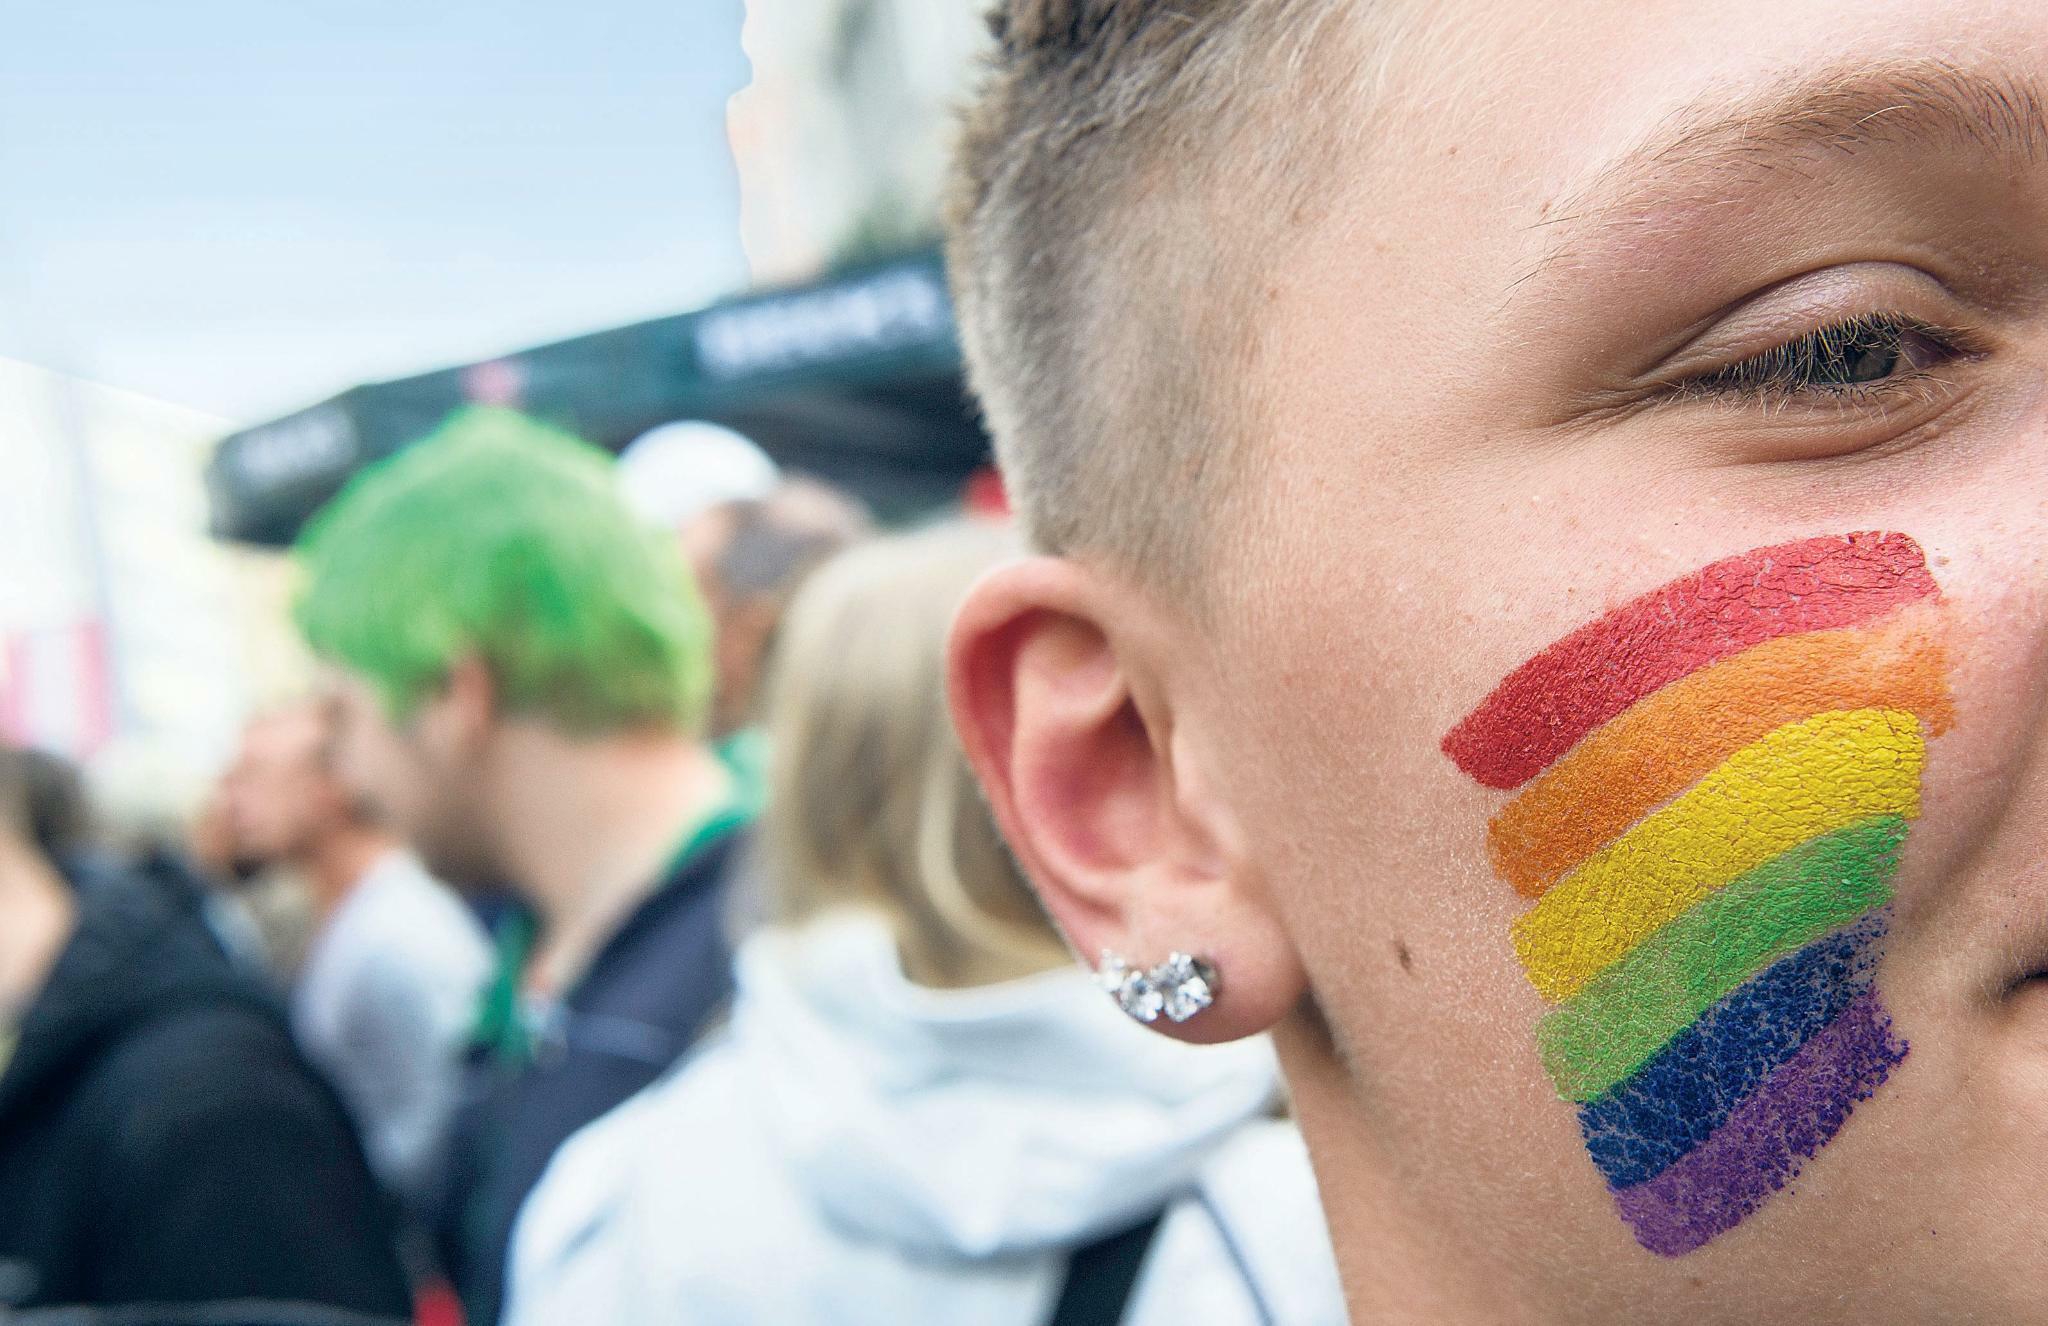 Hilfe Für Junge Lgbts Berlin Bekommt Ein Queeres